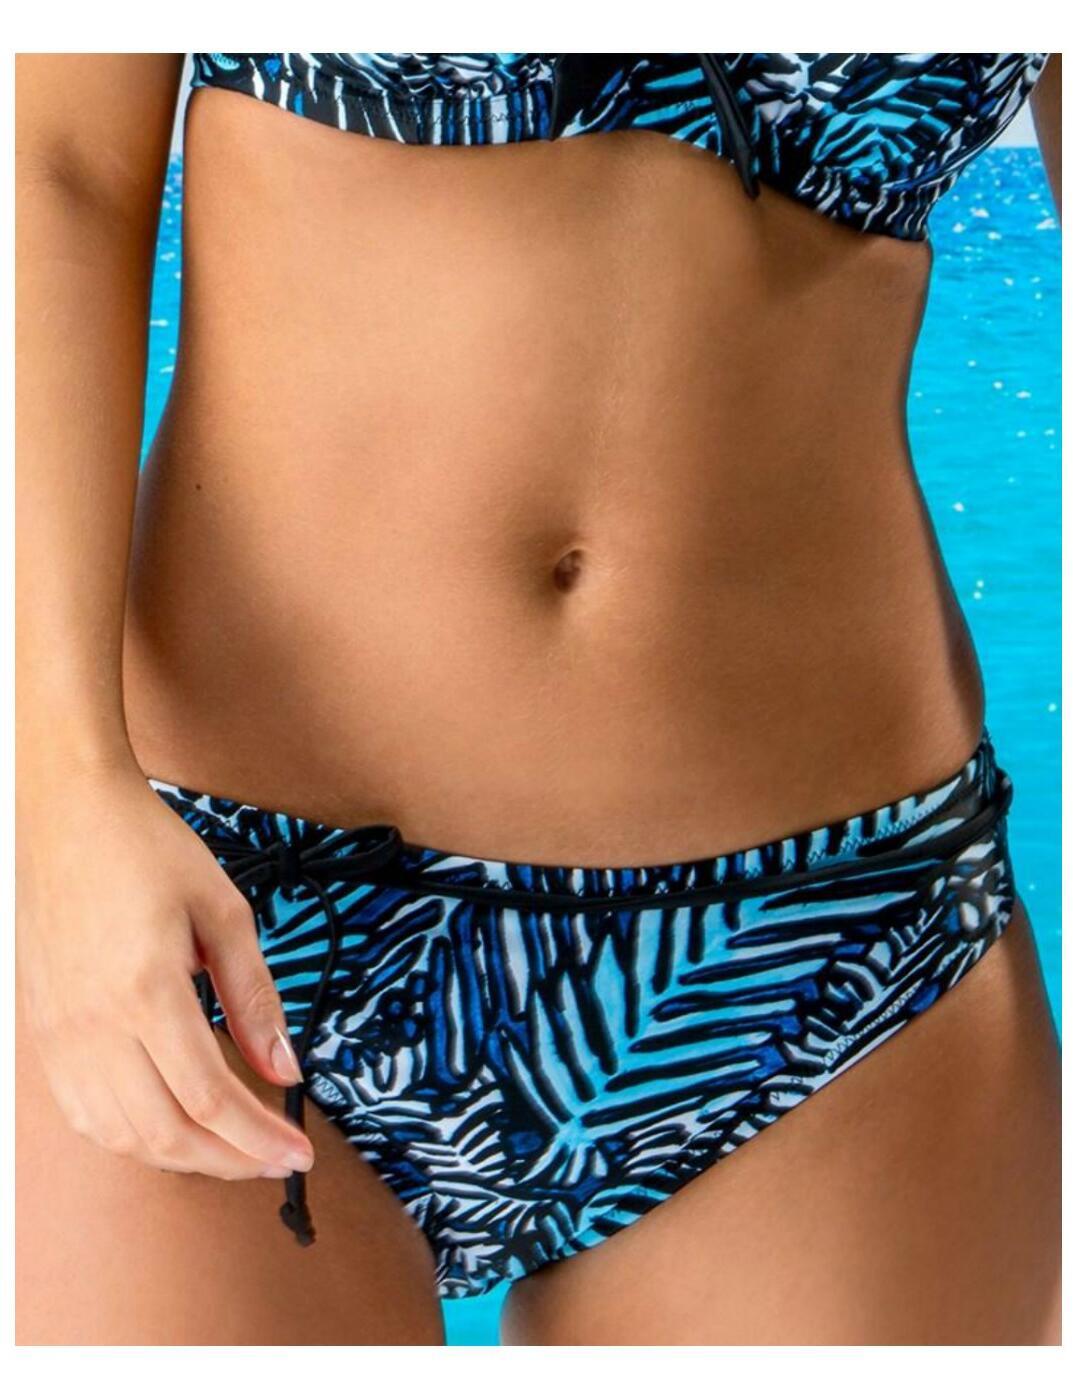 45005 Pour Moi Barracuda Belted Bikini Brief - 45005 Blue/Black